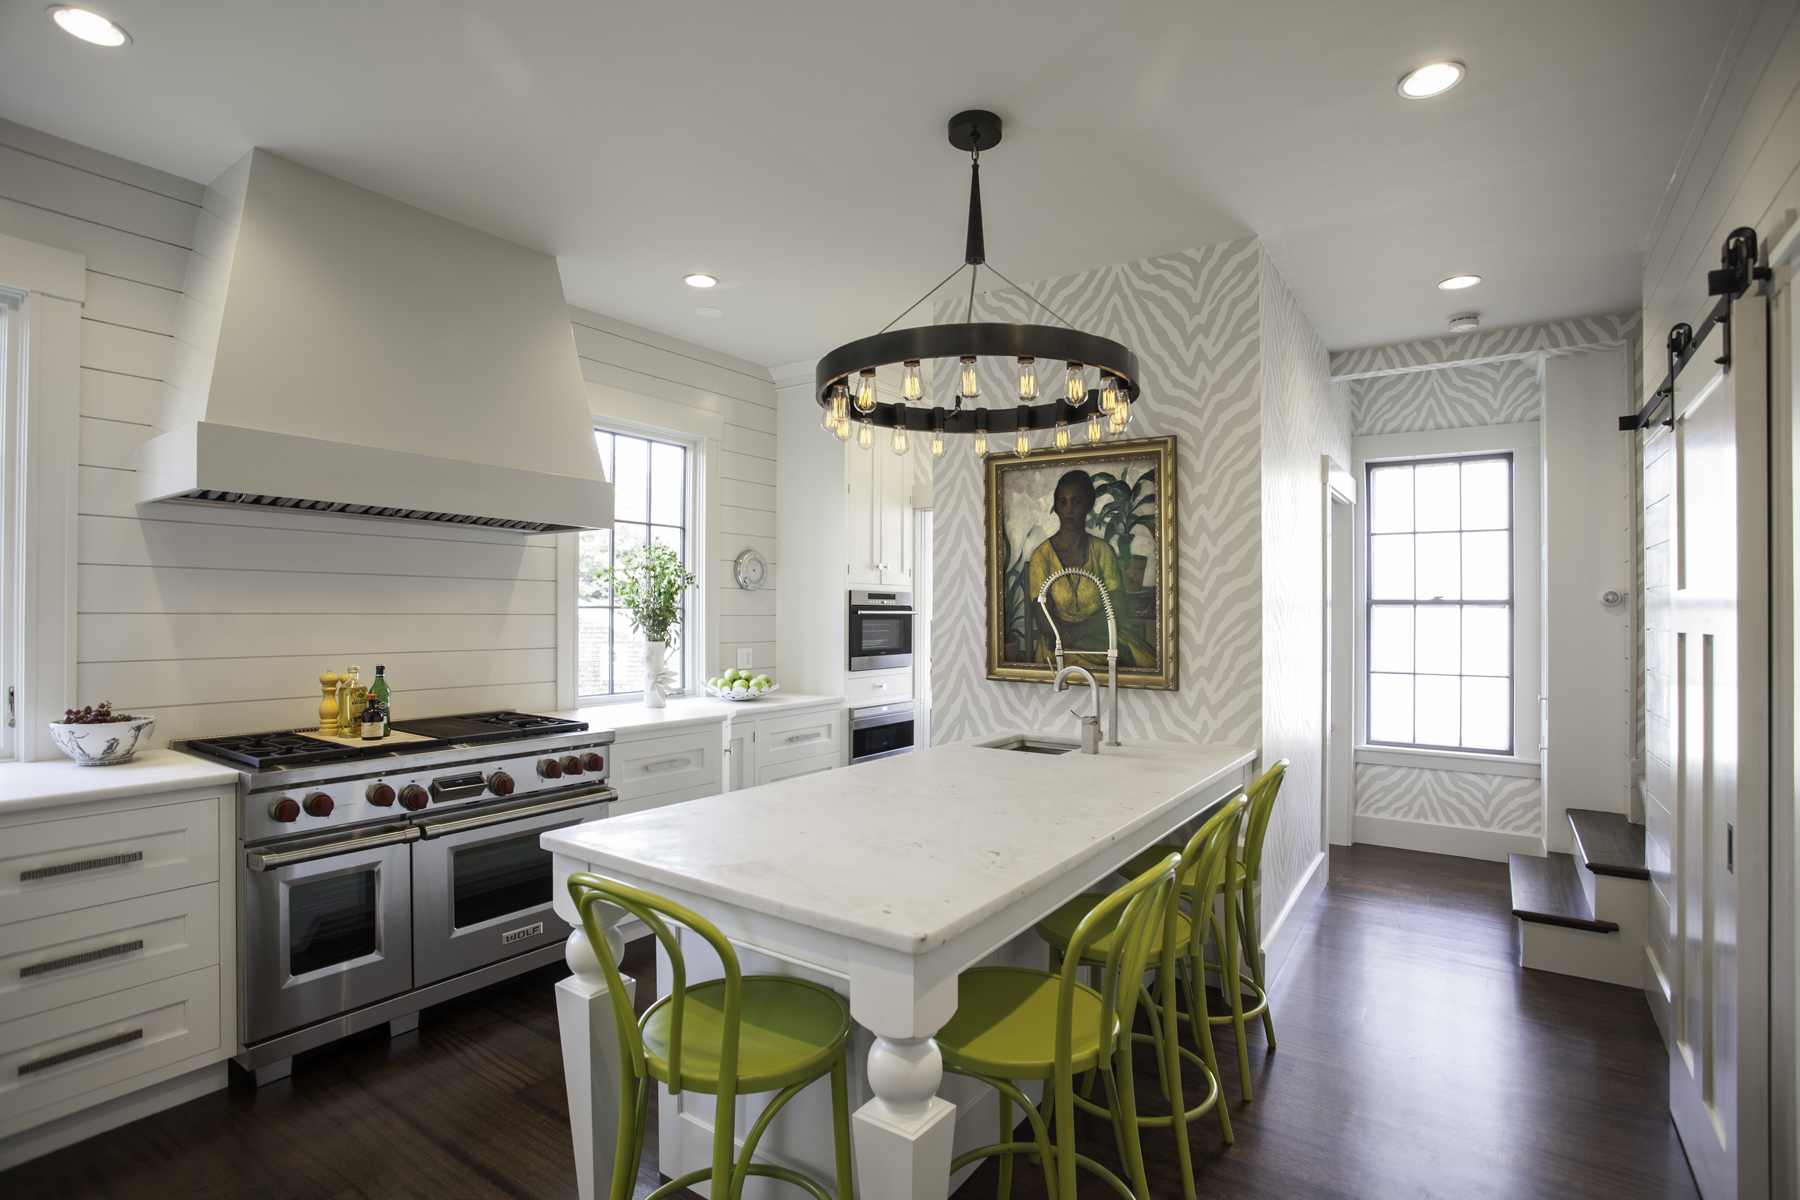 Sub Zero and Wolf award winning kitchen design by Karen Swanson of New 1800x1200